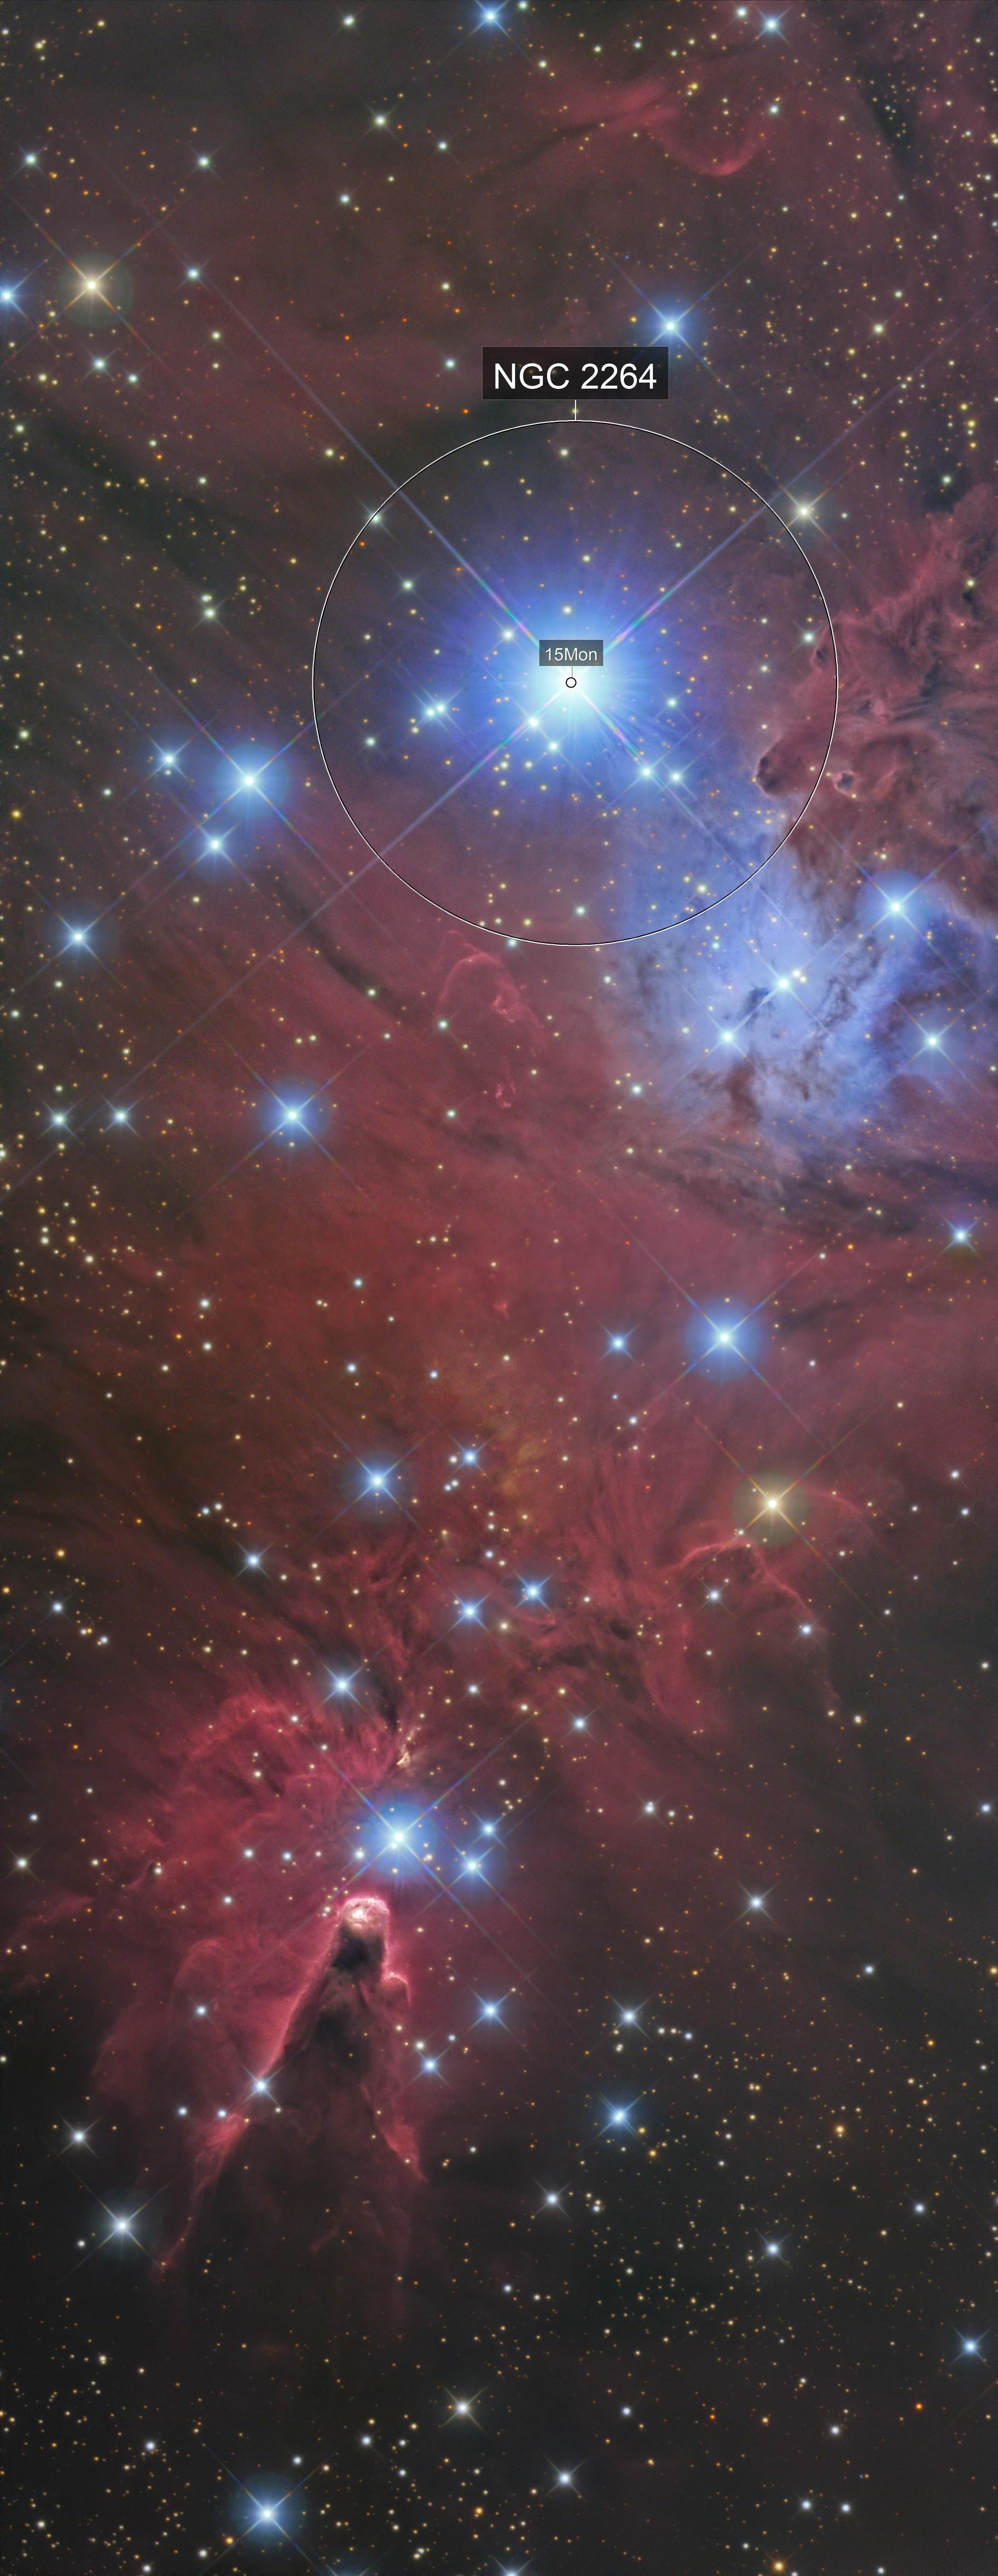 cone nebula / ngc 2264